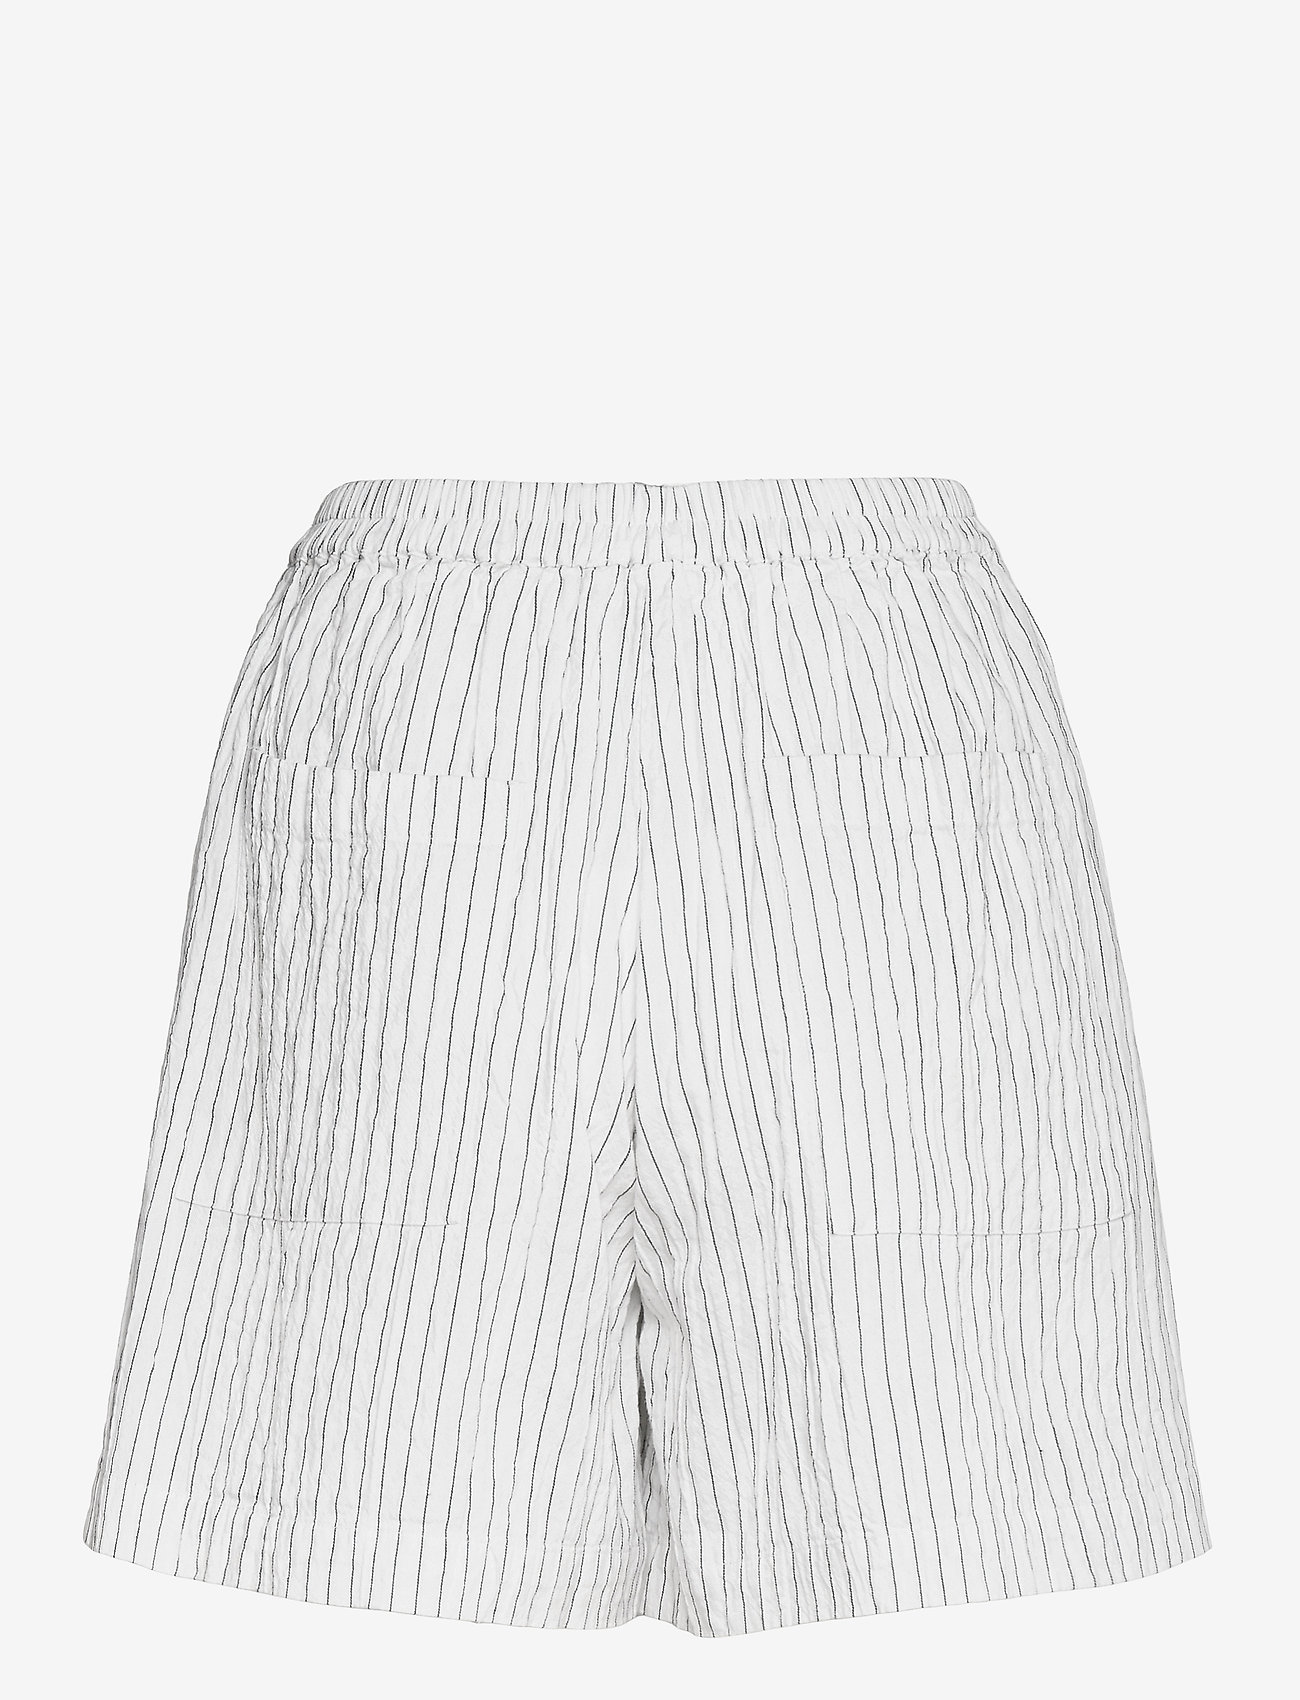 nué notes - Juliana Shorts - shorts casual - white - 1